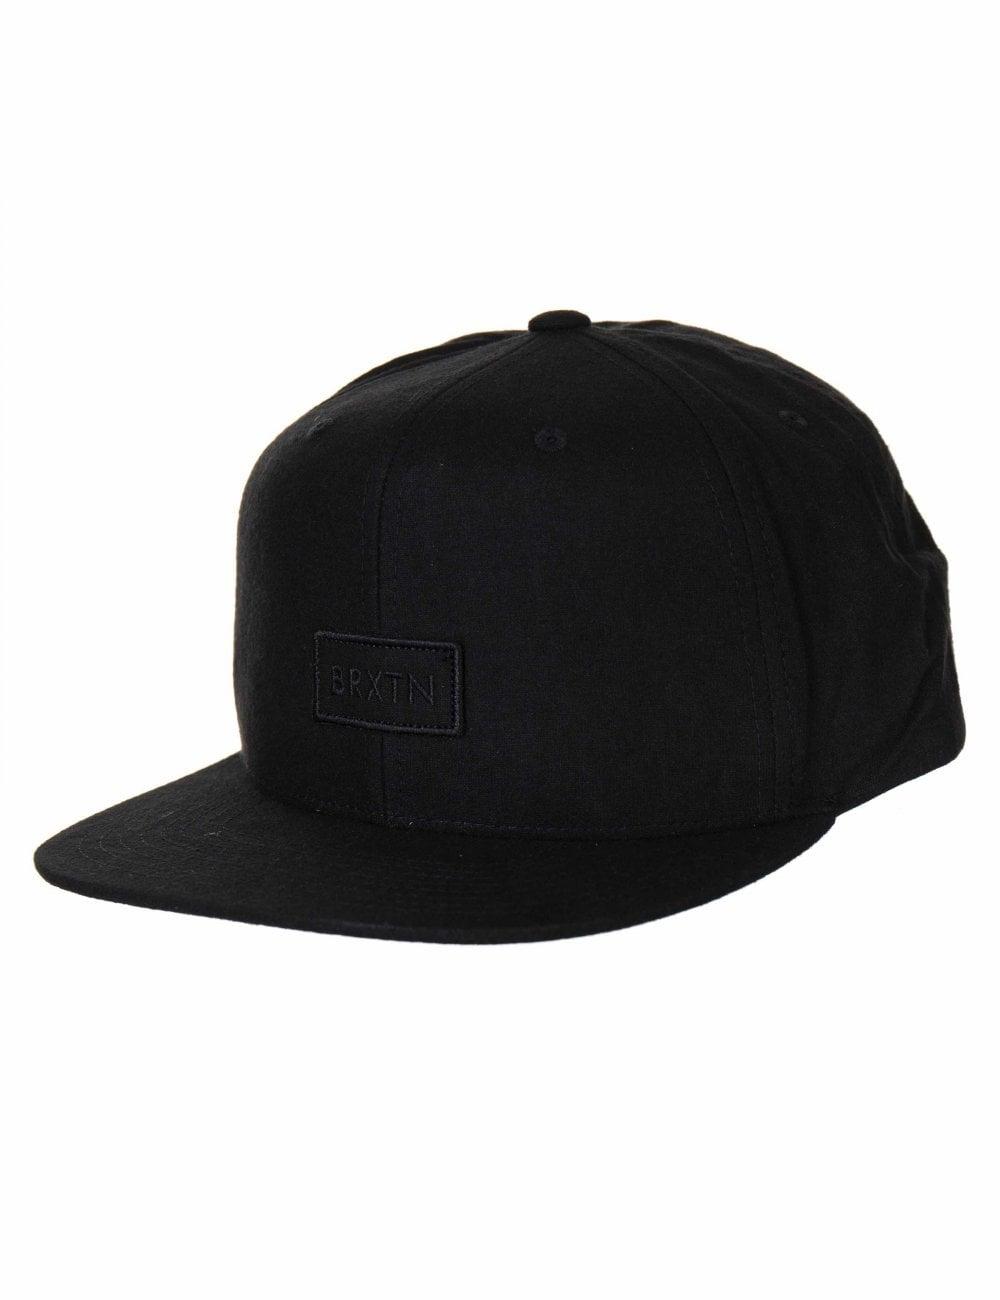 b86b03d50d Rift II Snapback Cap - Black